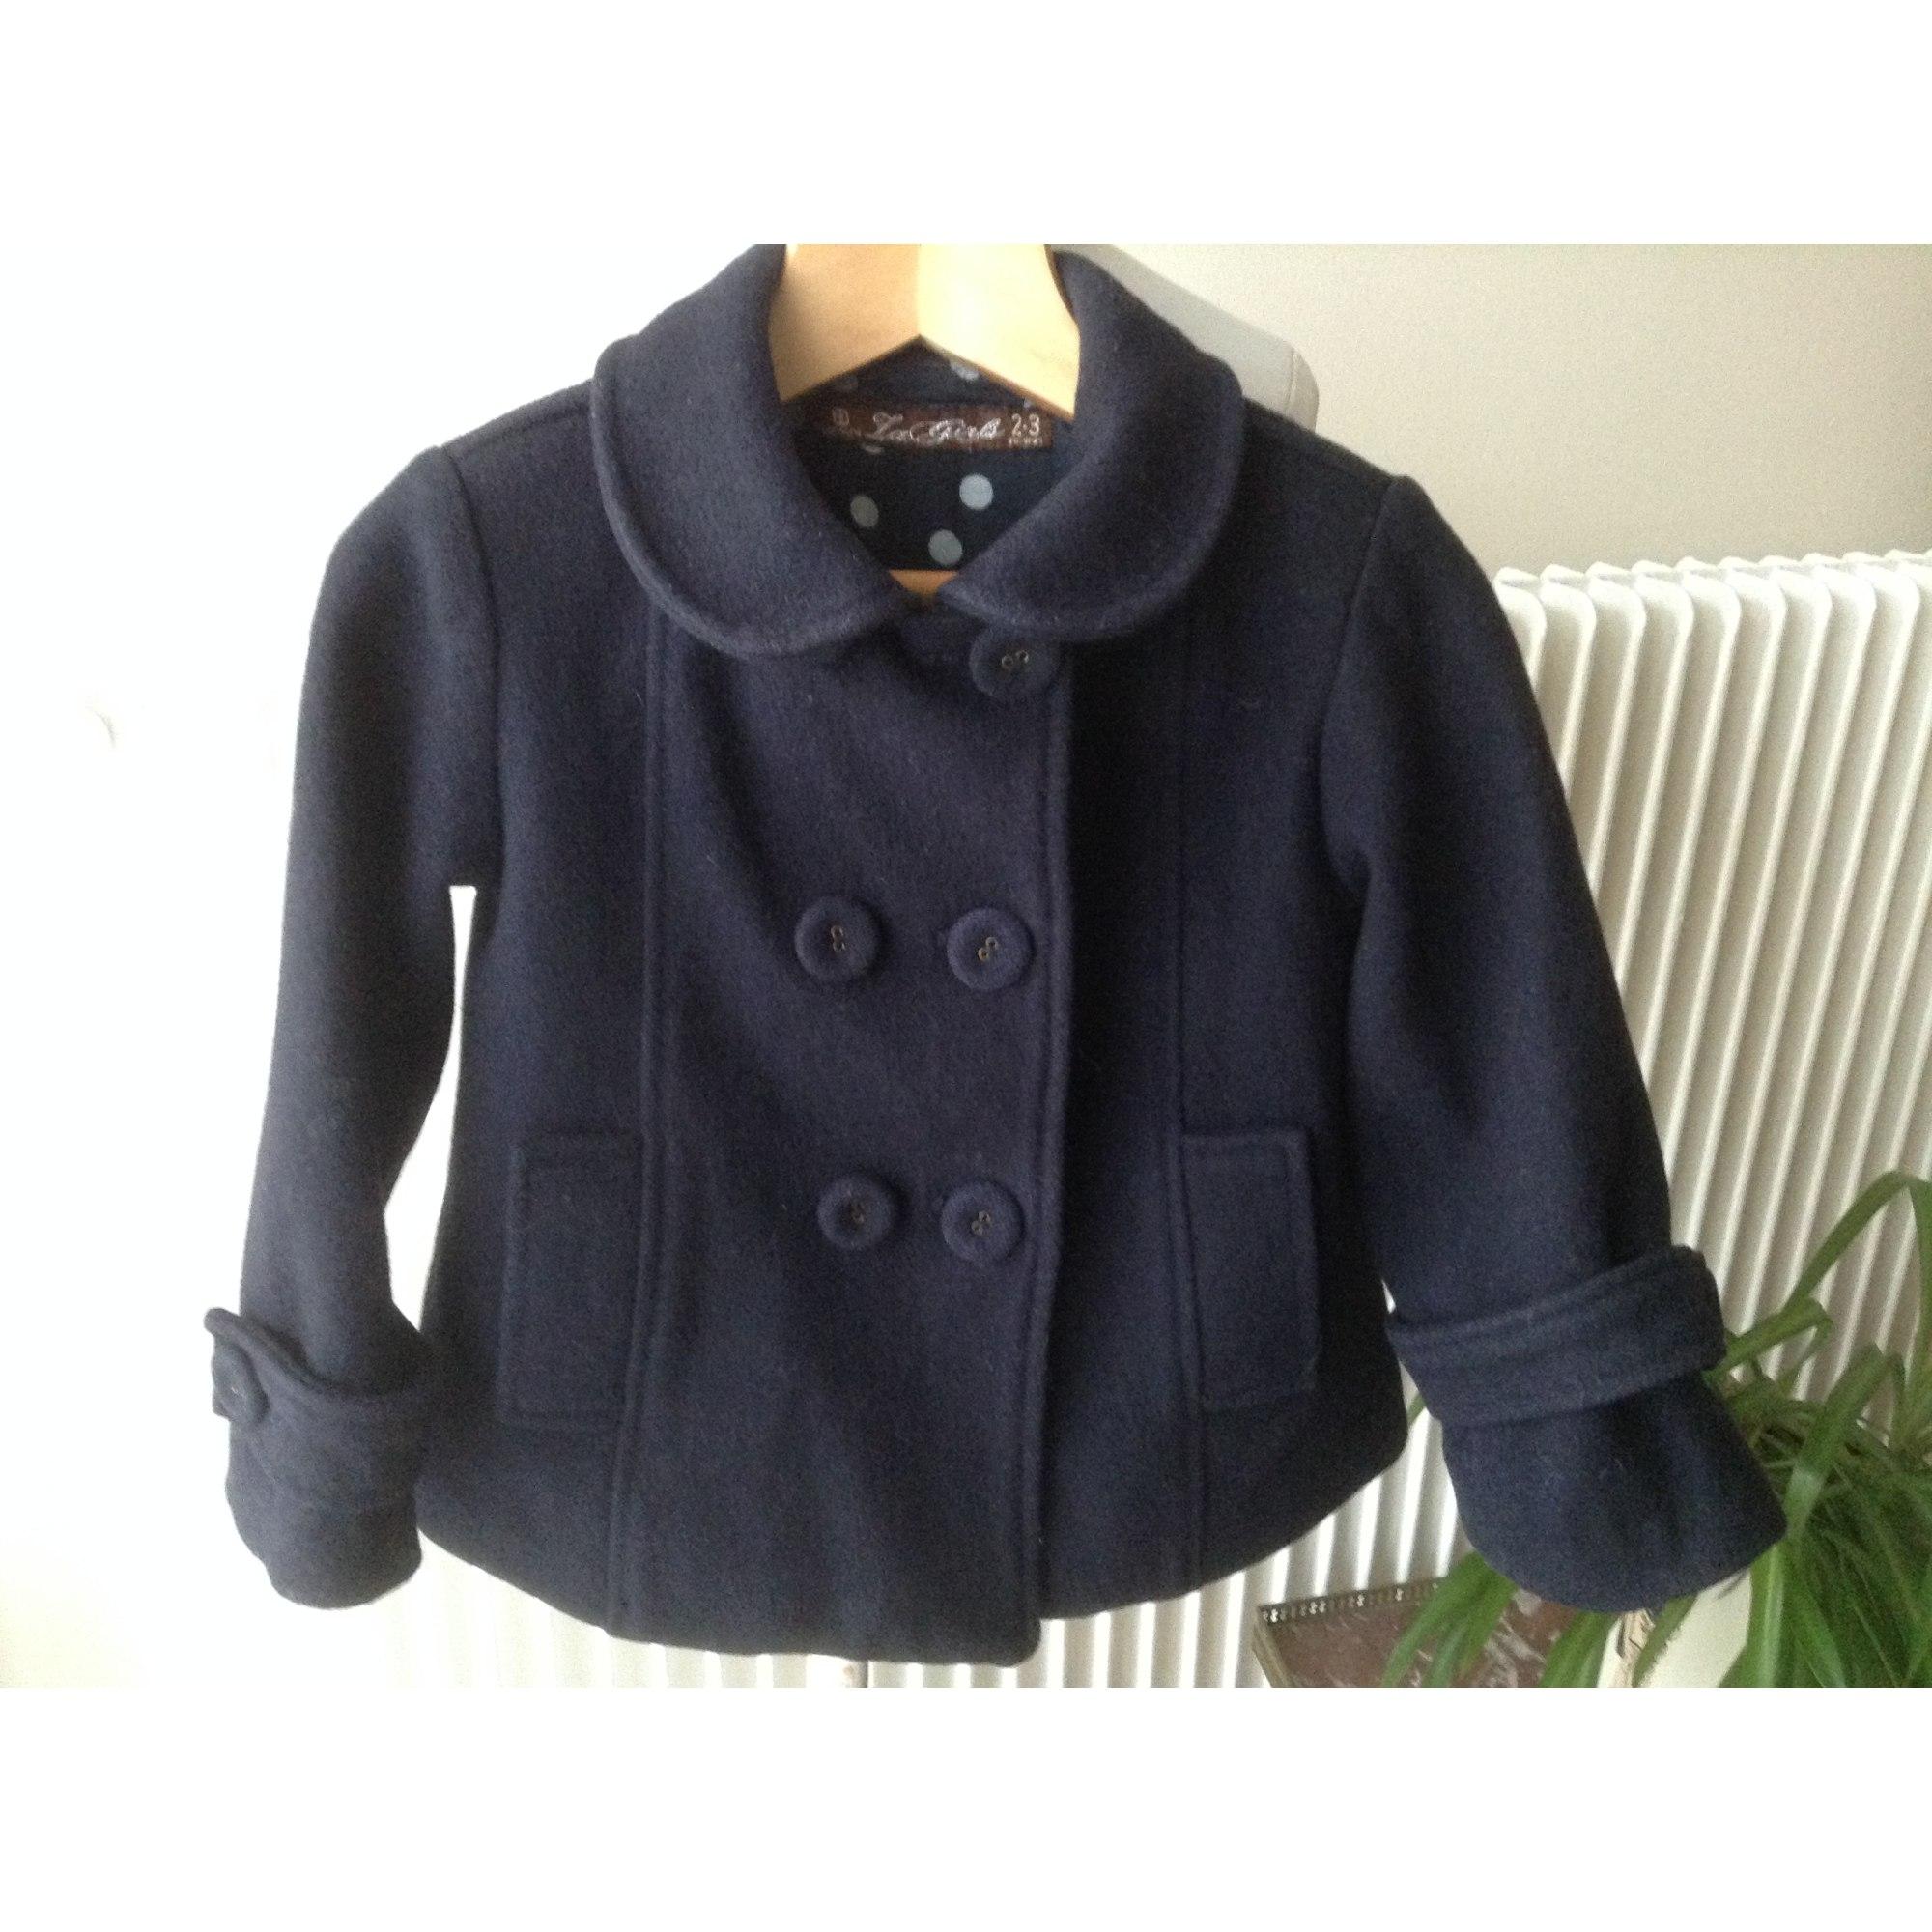 Manteau ZARA LA GIRLS 2 ans bleu vendu par Natasha 5895723